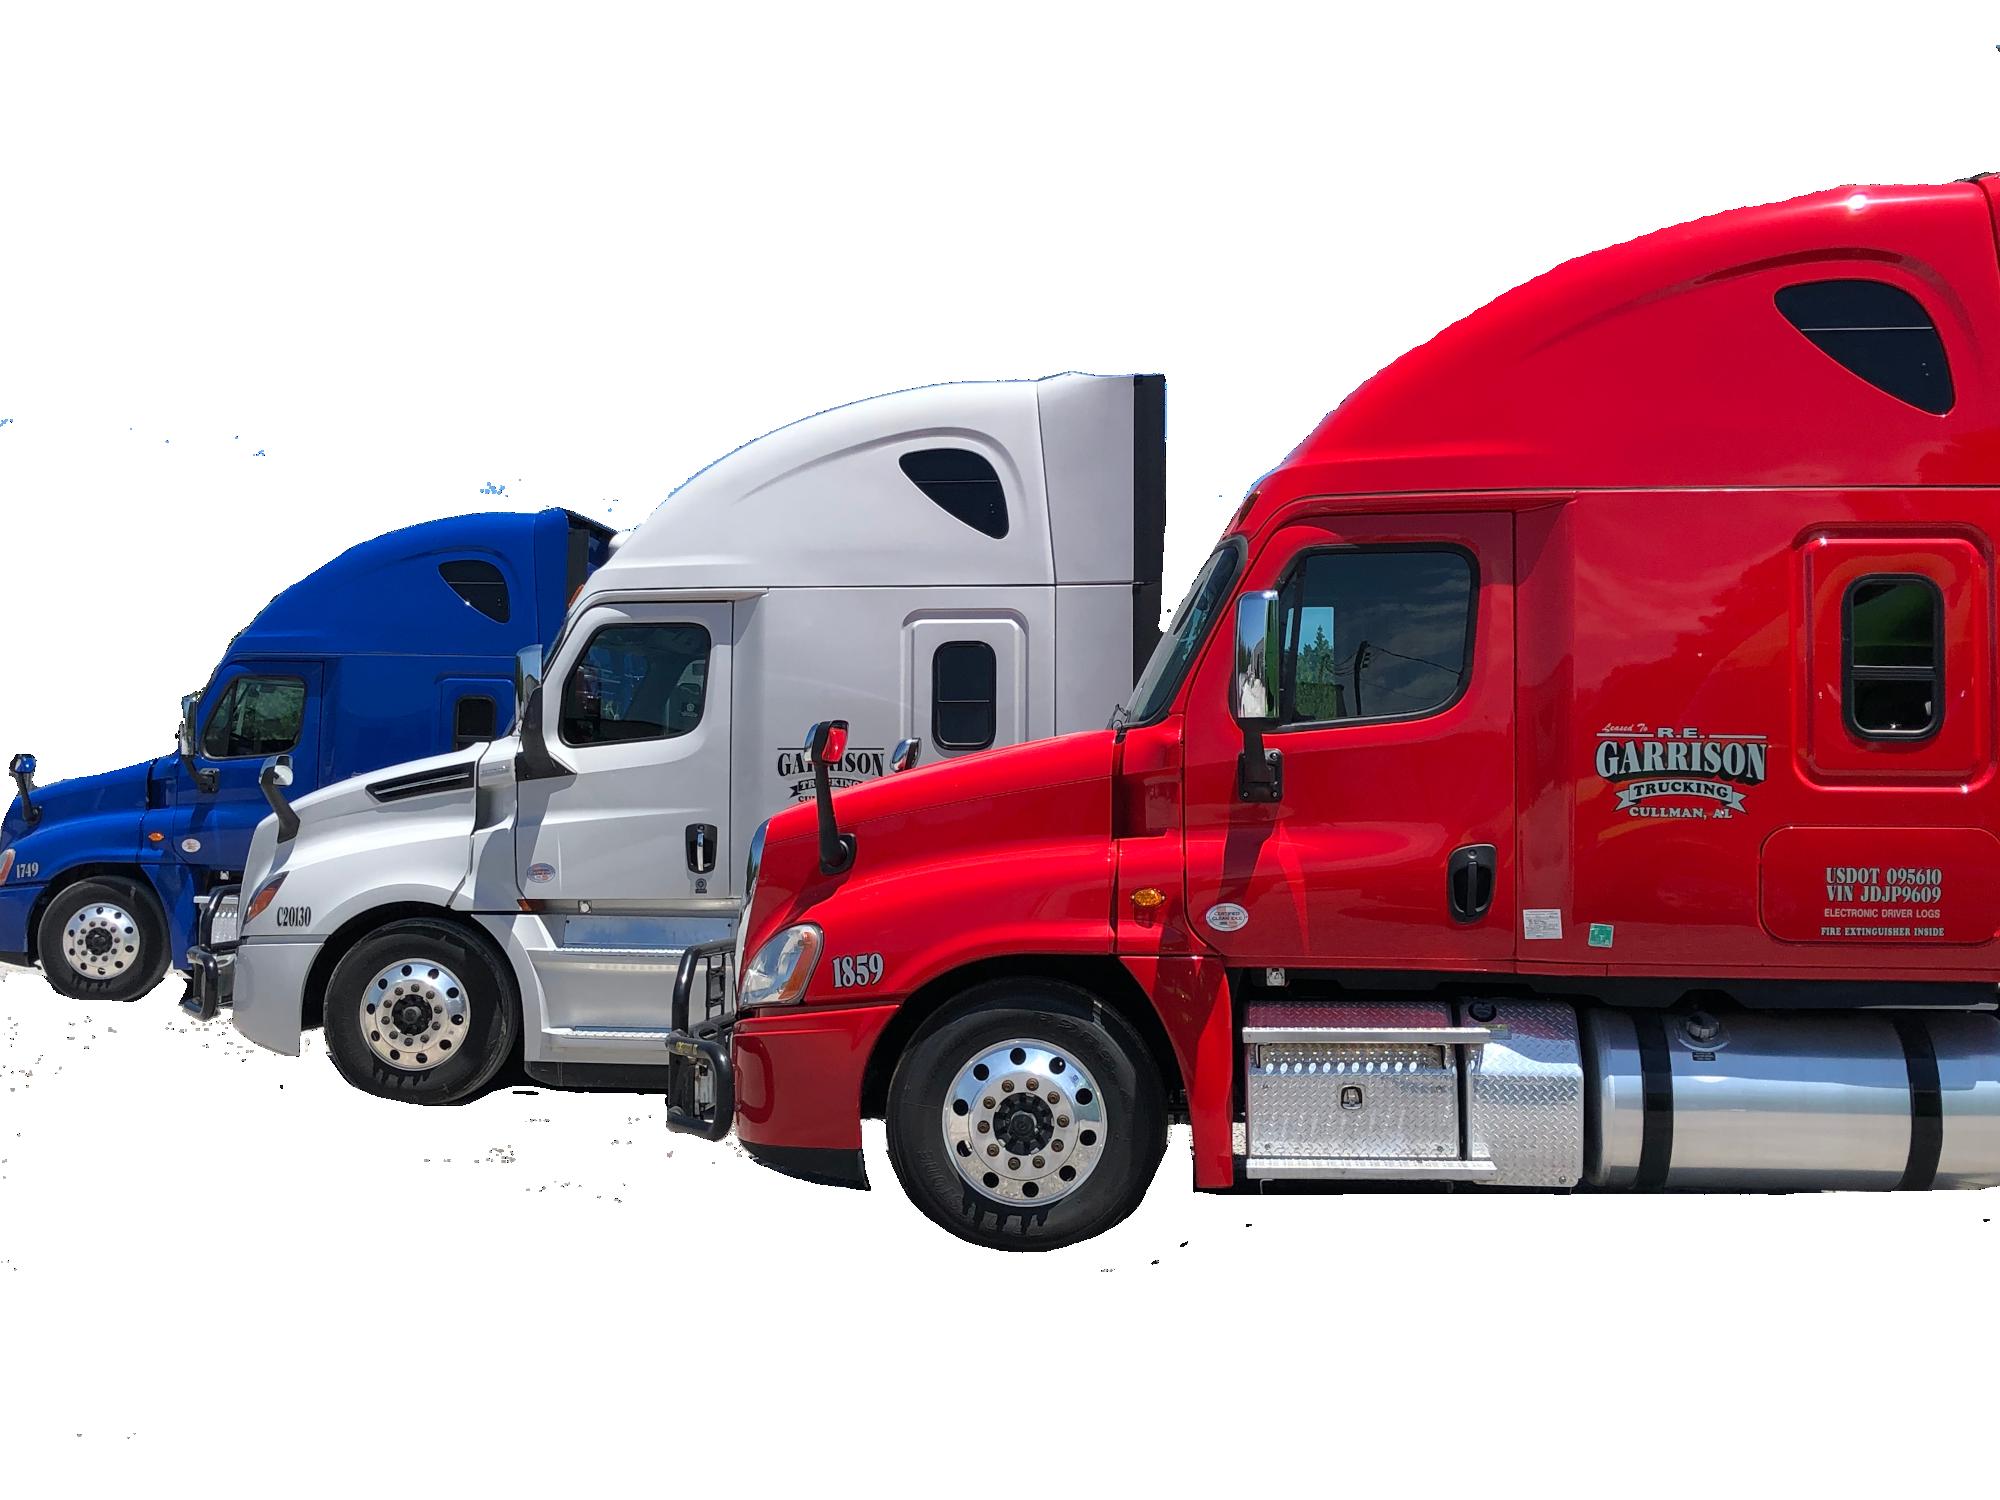 R.E. Garrison Truck